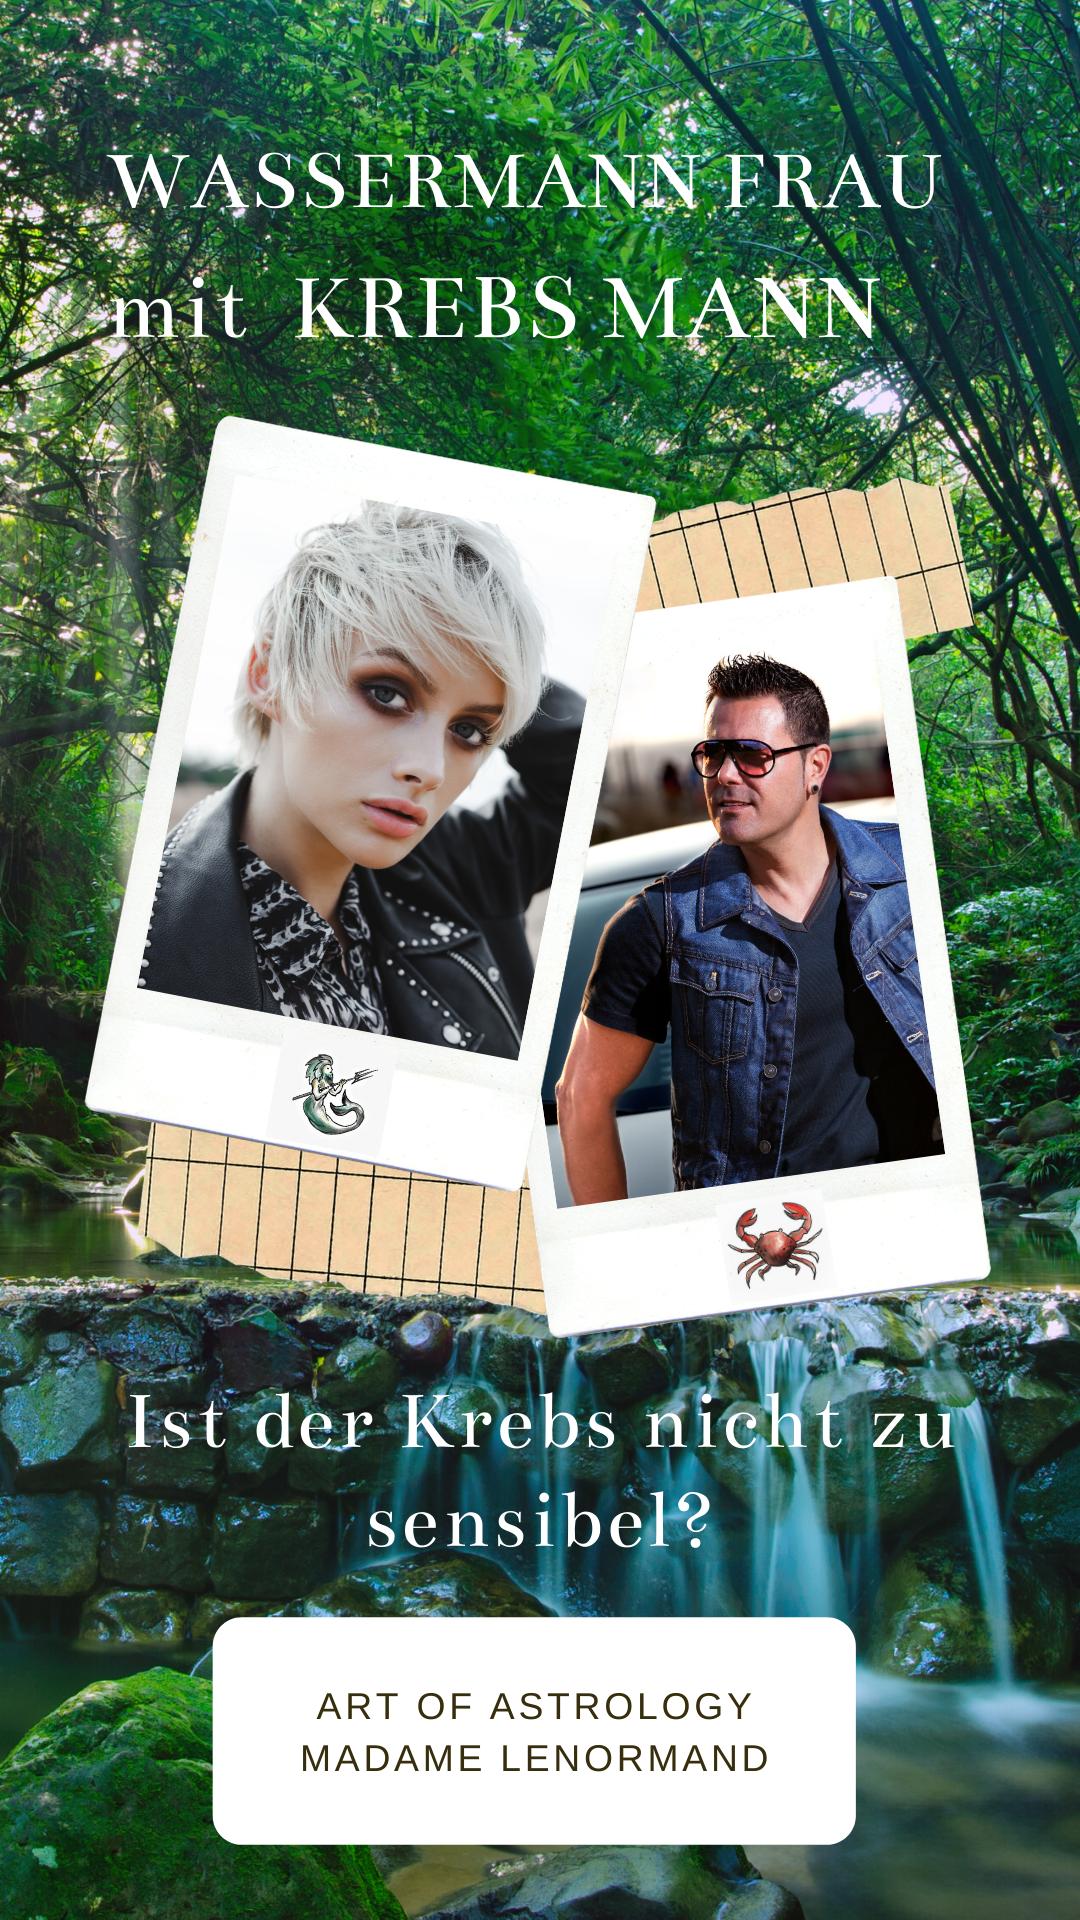 Krebs Mann & Wassermann Frau - Liebe? in 2020 | Krebs mann